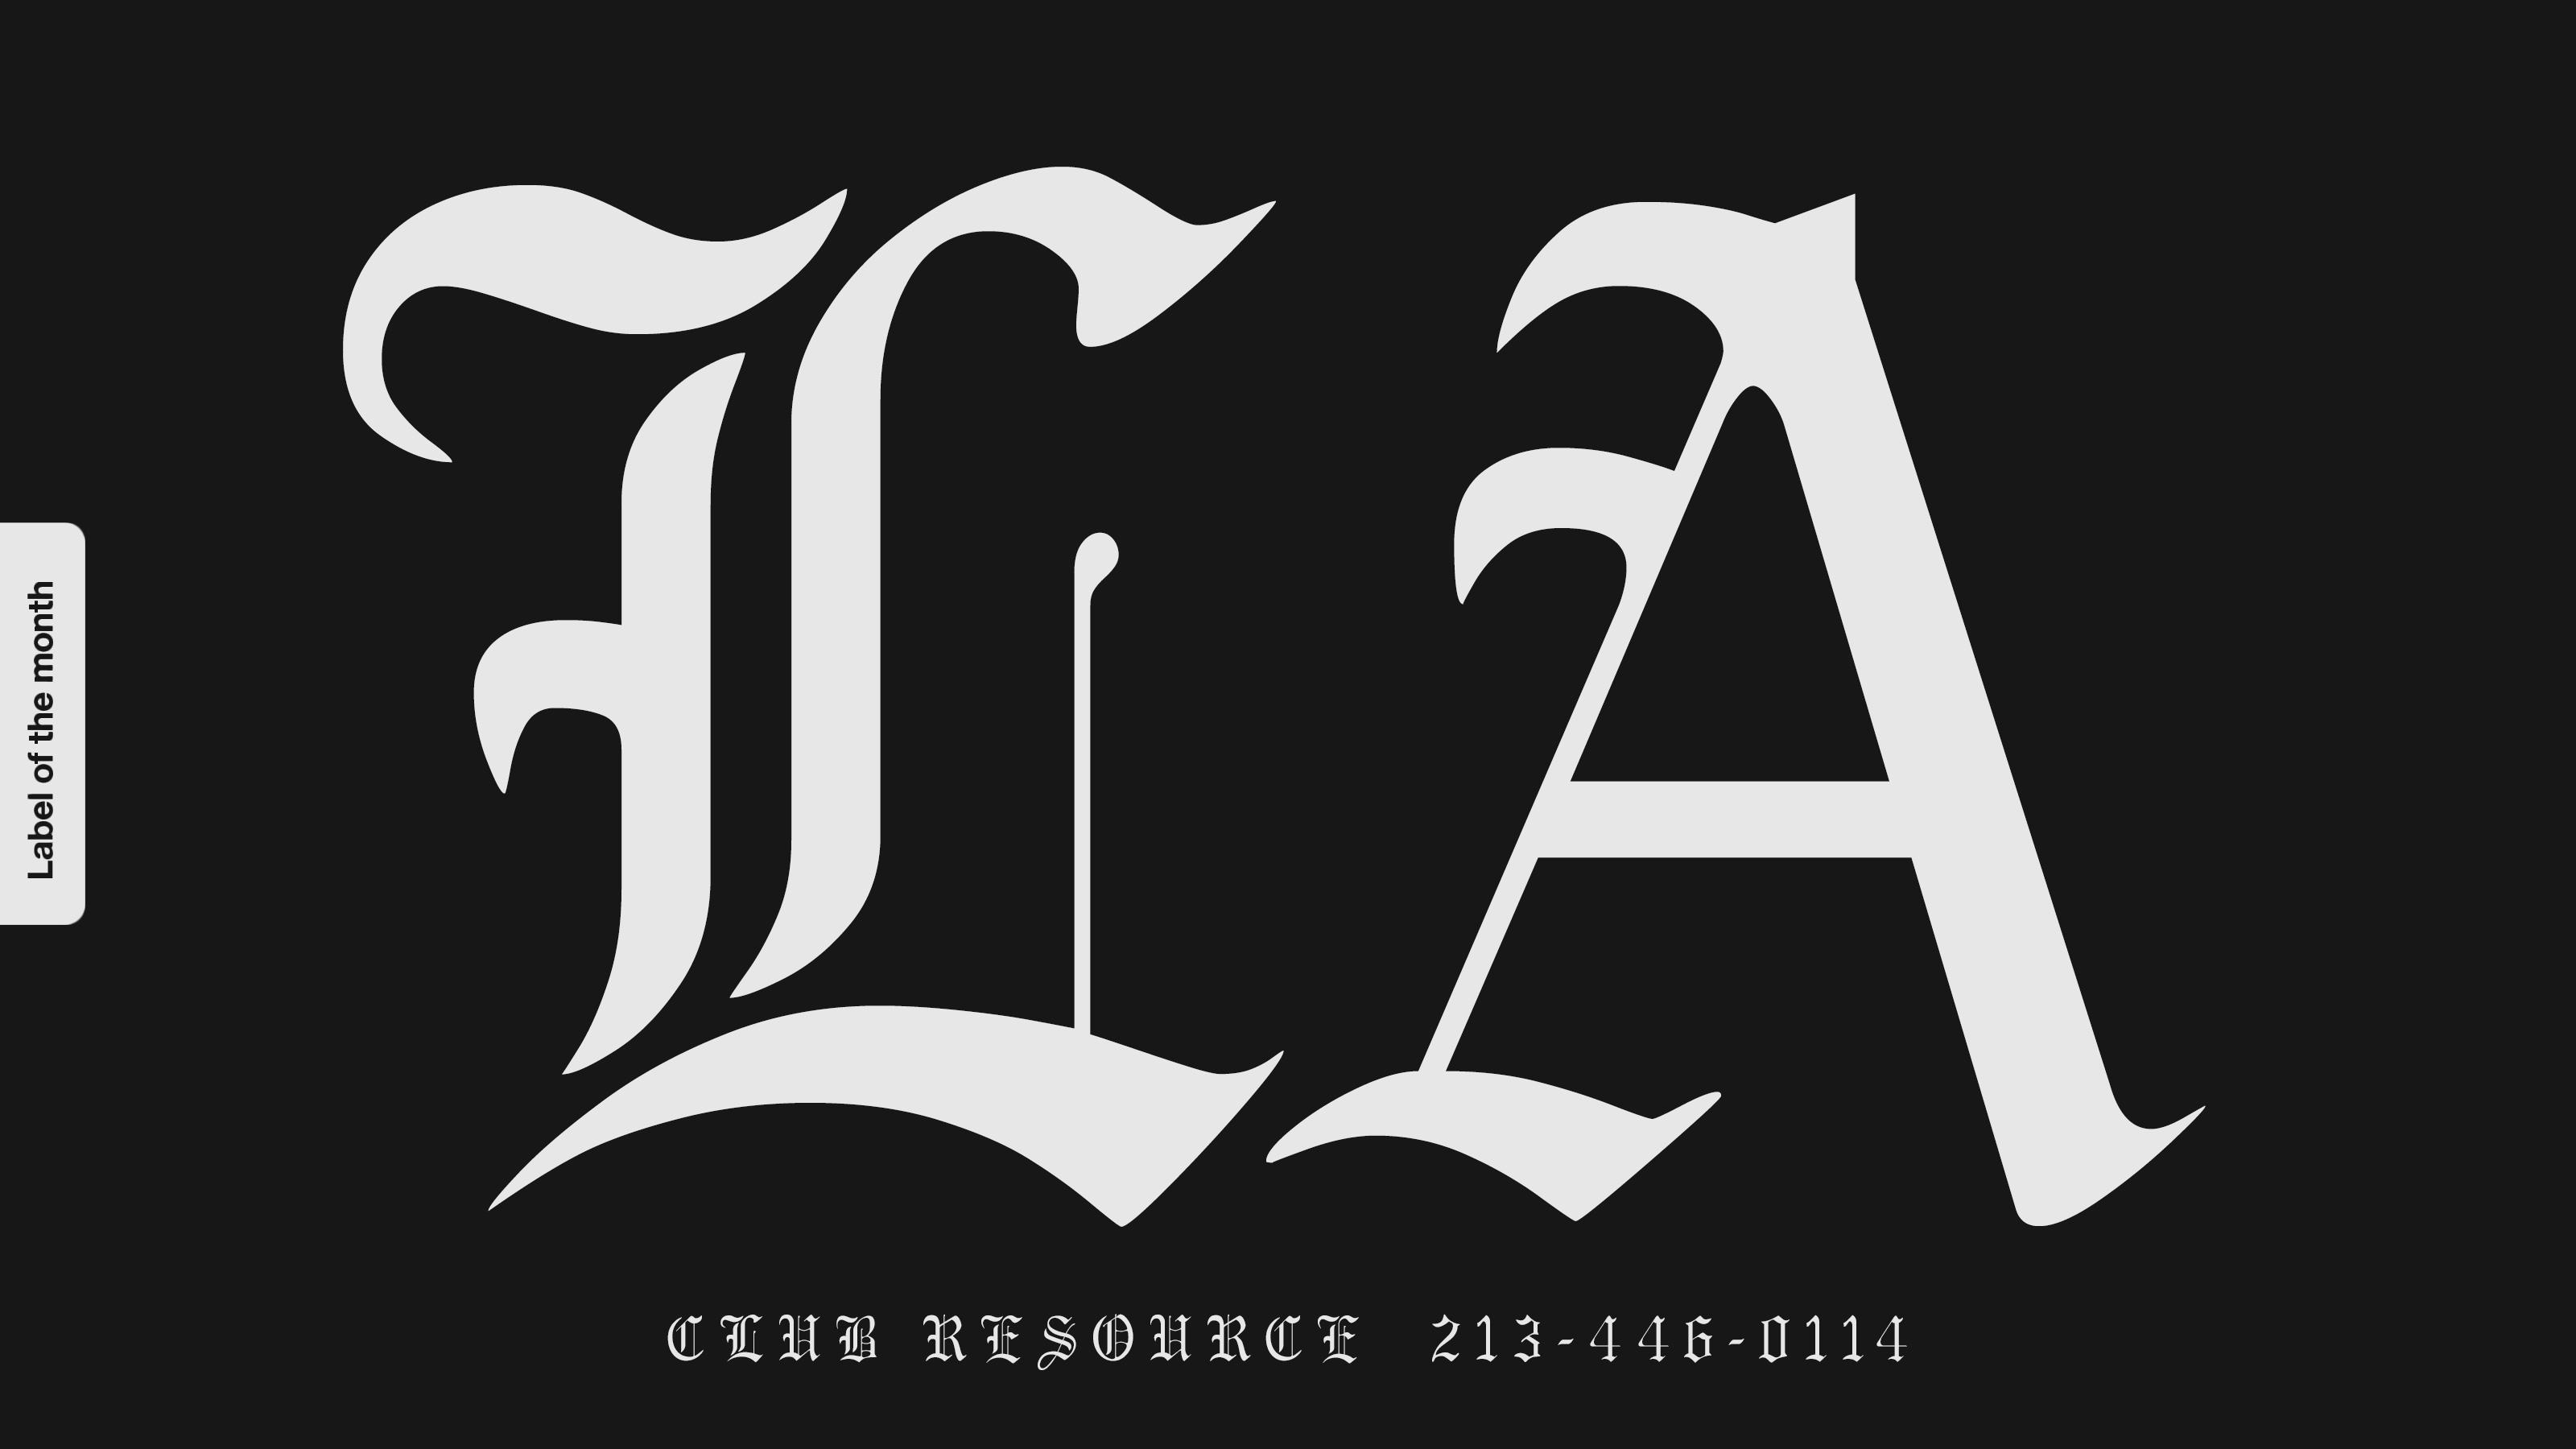 ra label of the month la club resource. Black Bedroom Furniture Sets. Home Design Ideas